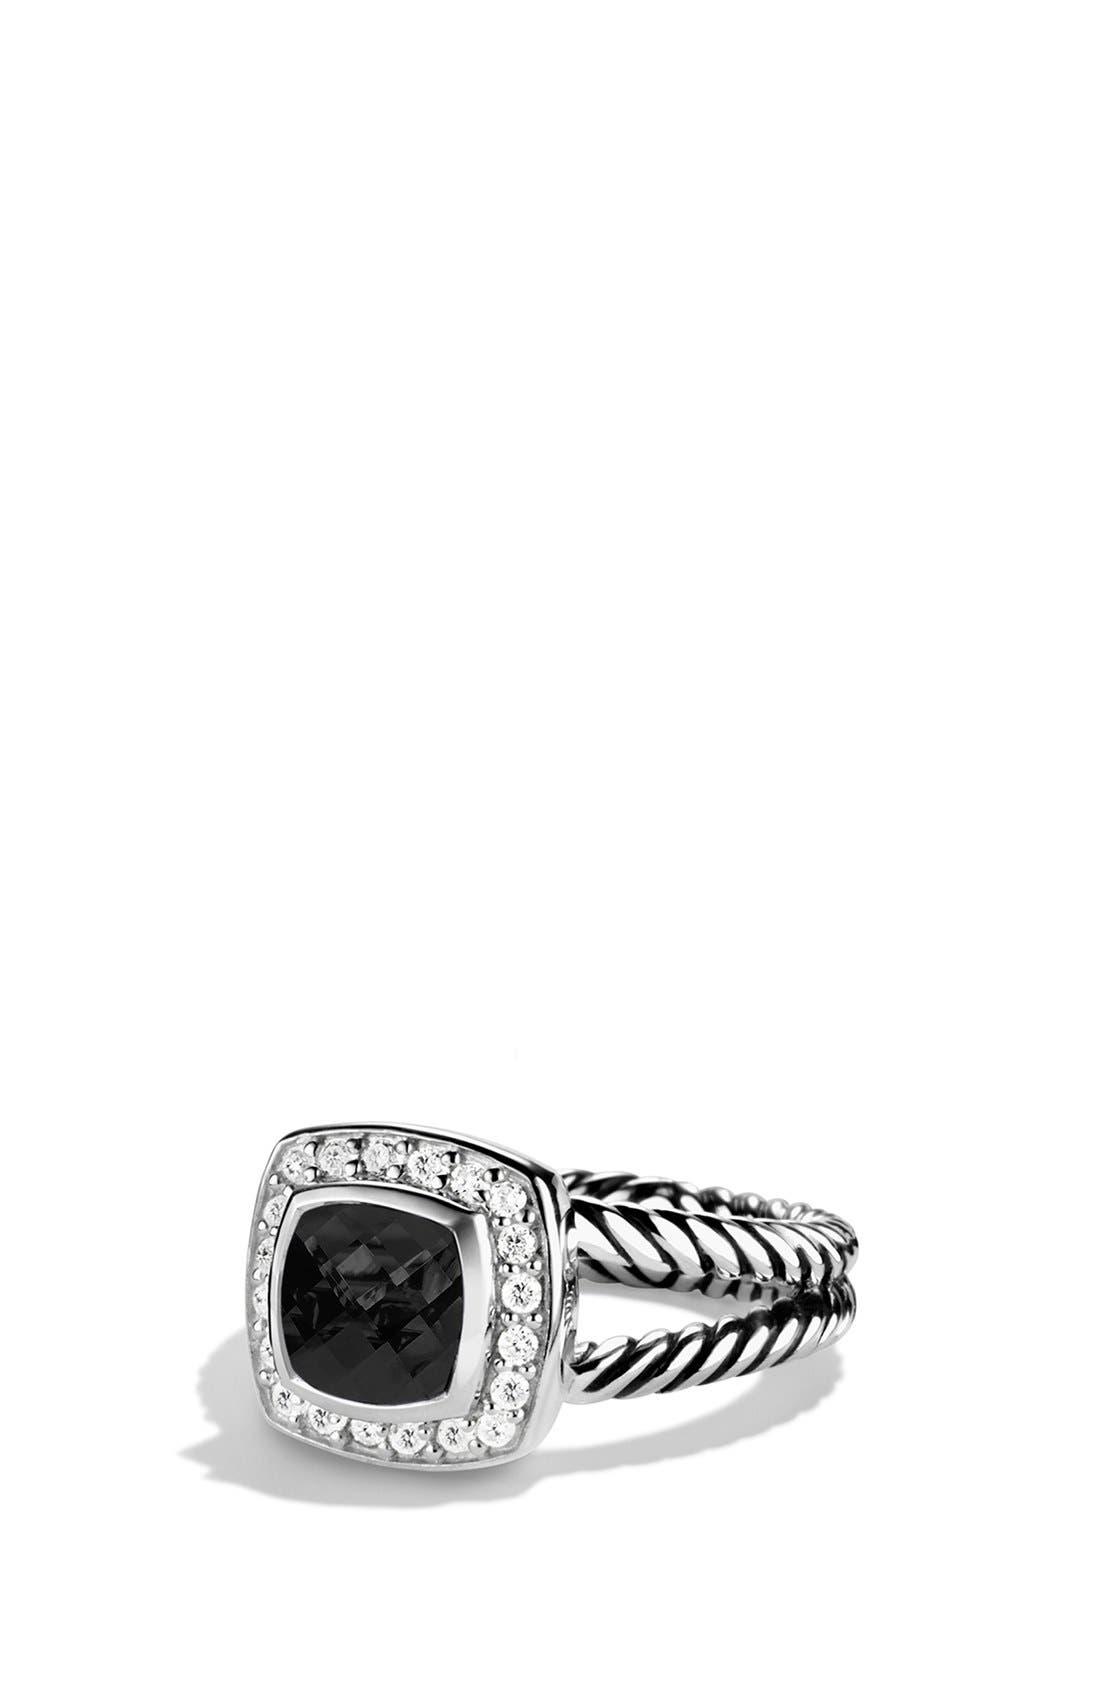 david yurman petite ring with stone u0026 diamonds